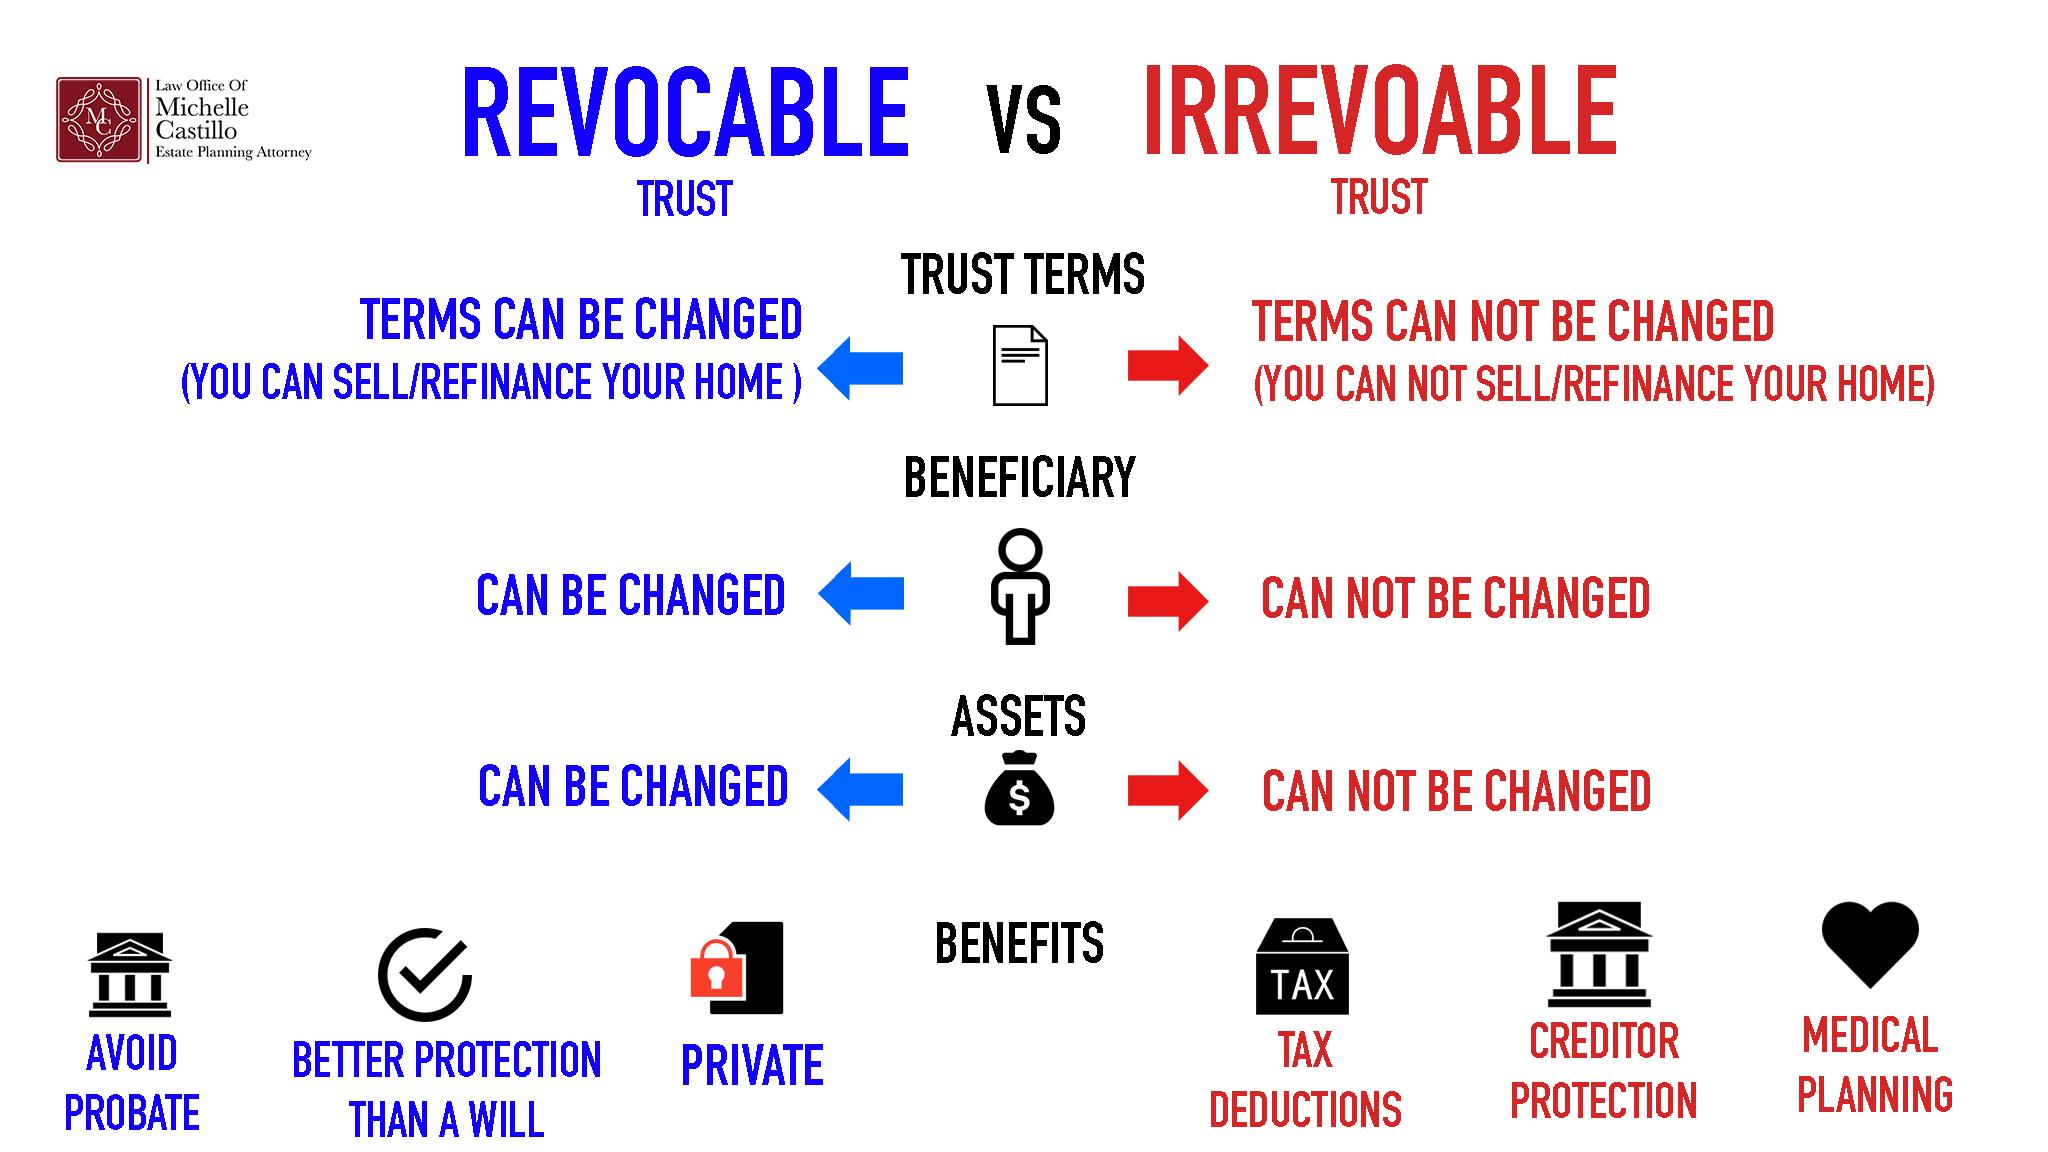 REVOCABLE_VS_IRREVOCABLE_LIVING_TRUST_LAWYER_GRANADA_HILLS.jpg